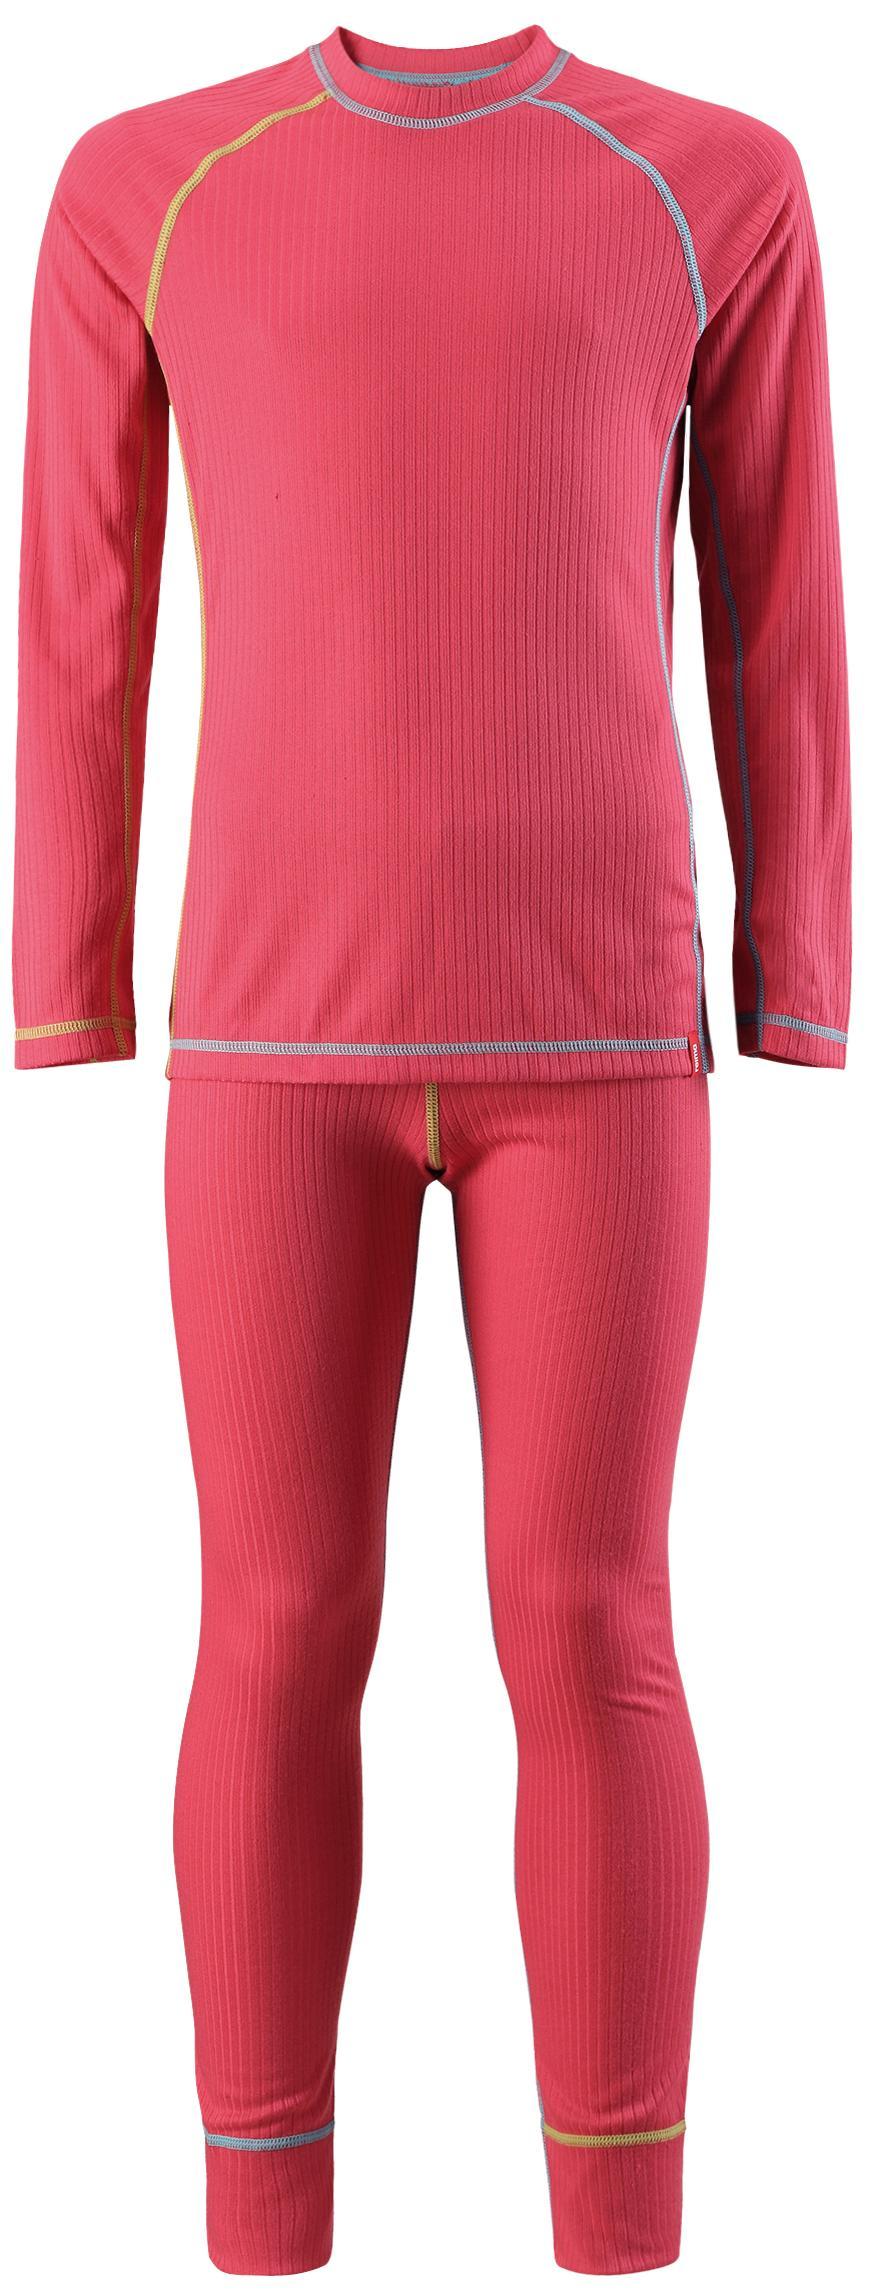 Комплект (футболка, длинный рукав, + брюки) Reima 2018-19 Cepheus STRAWBERRY RED, Брюки - арт. 1117620151